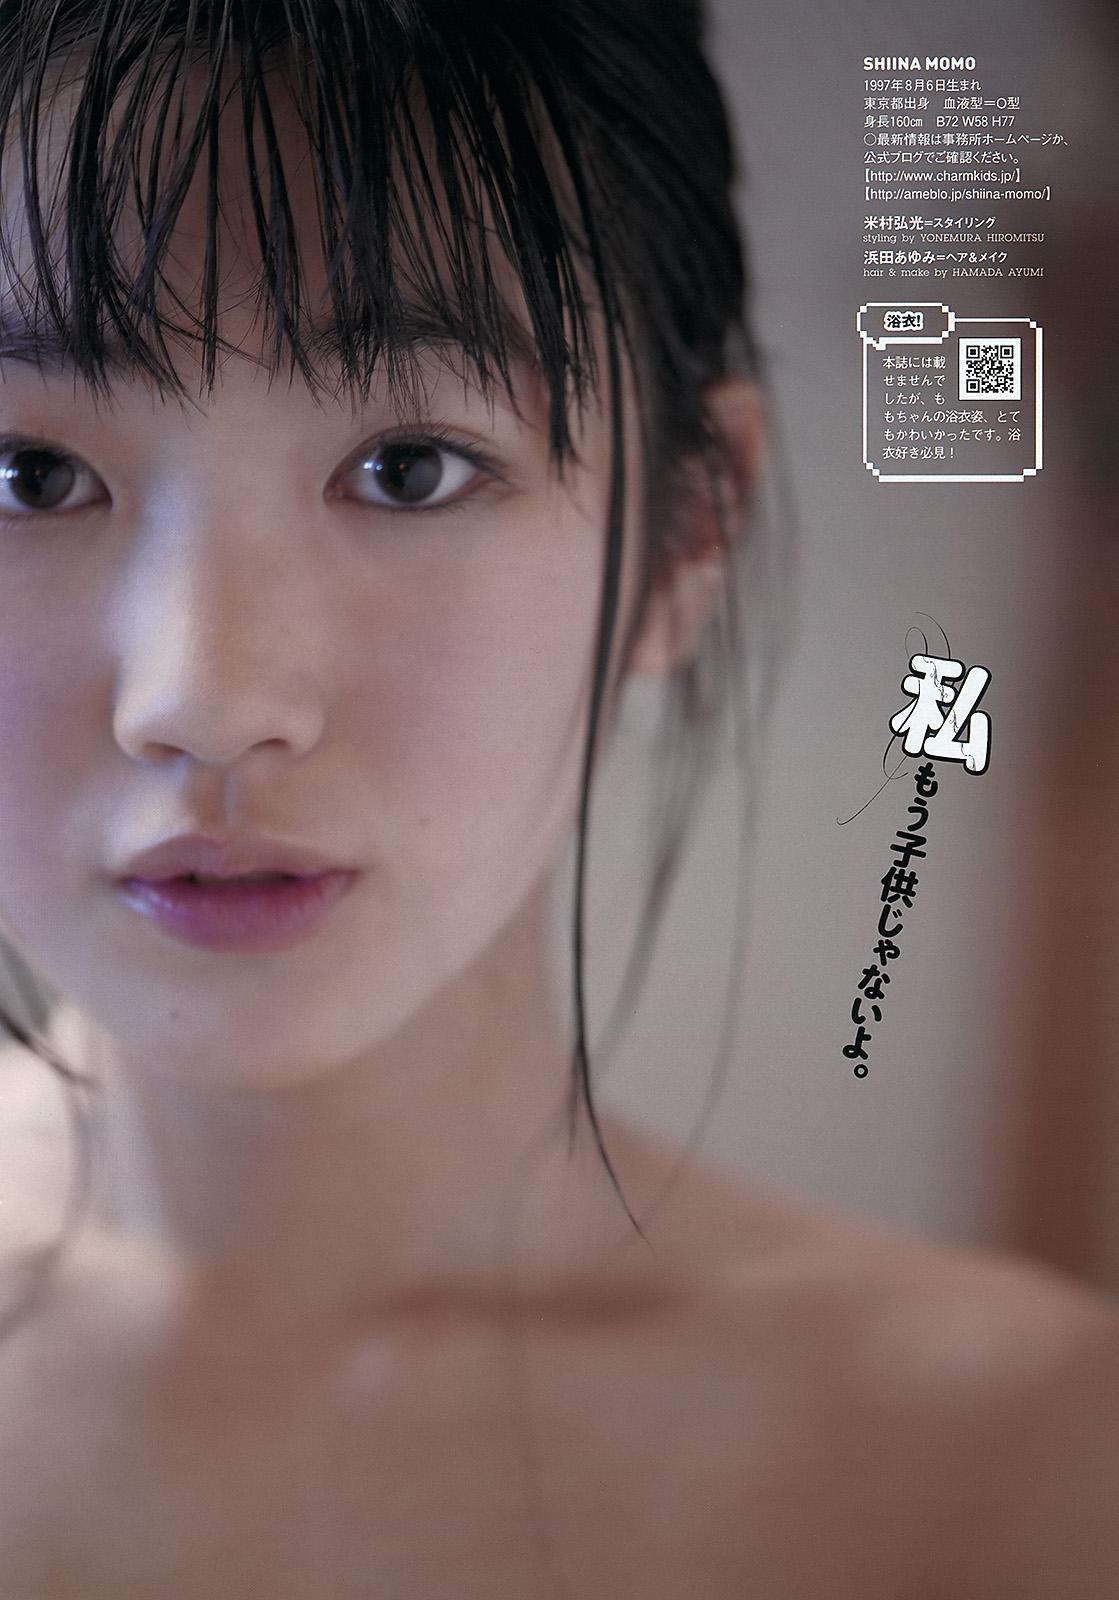 momo shiina shimacollenude 17.jpg